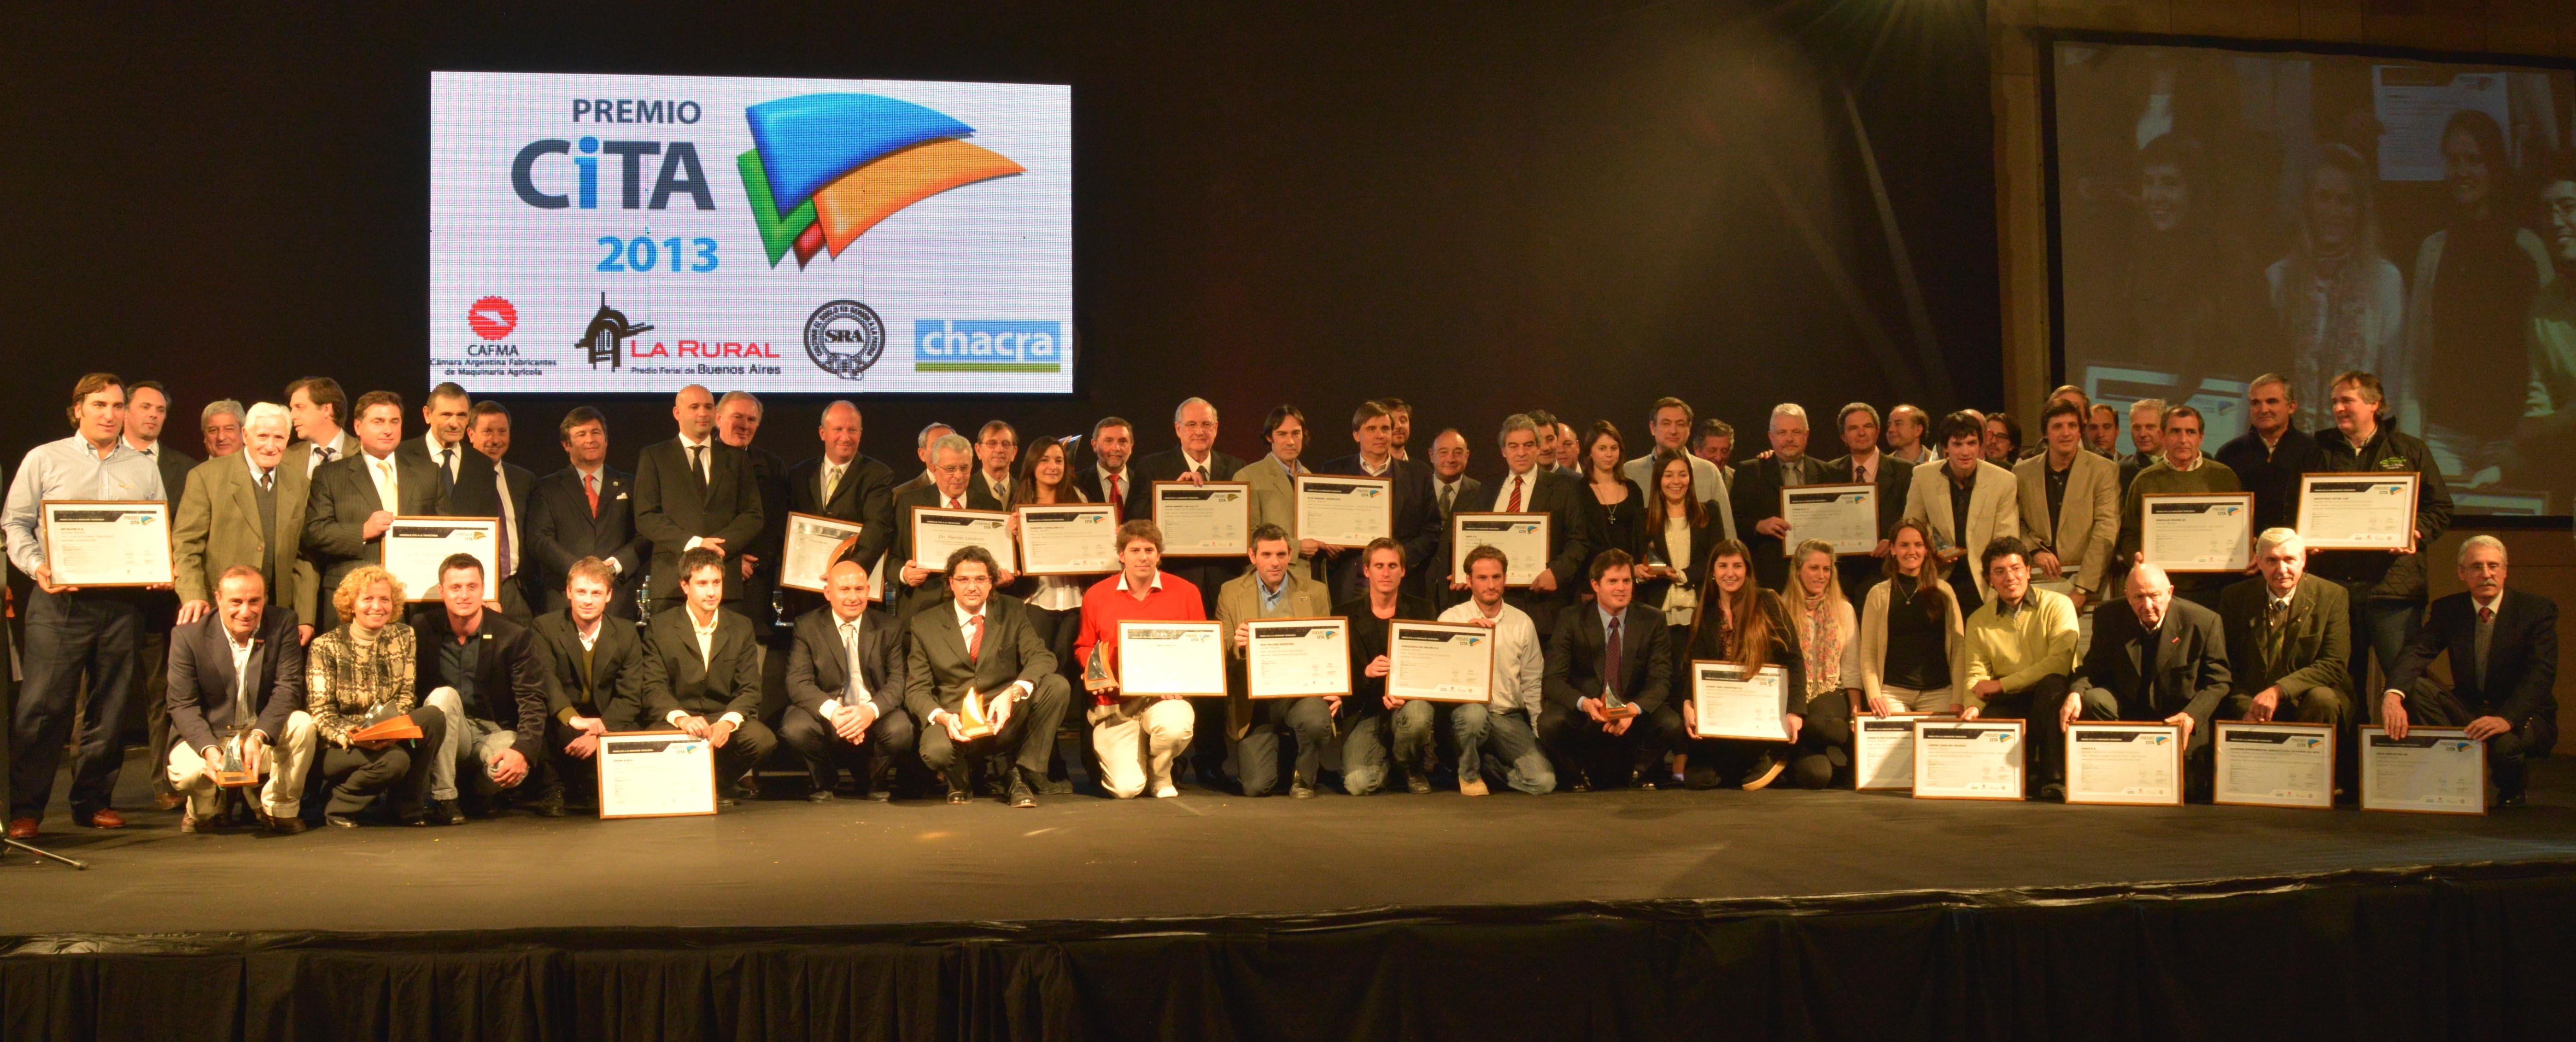 2013-06-cita-2013-premiados